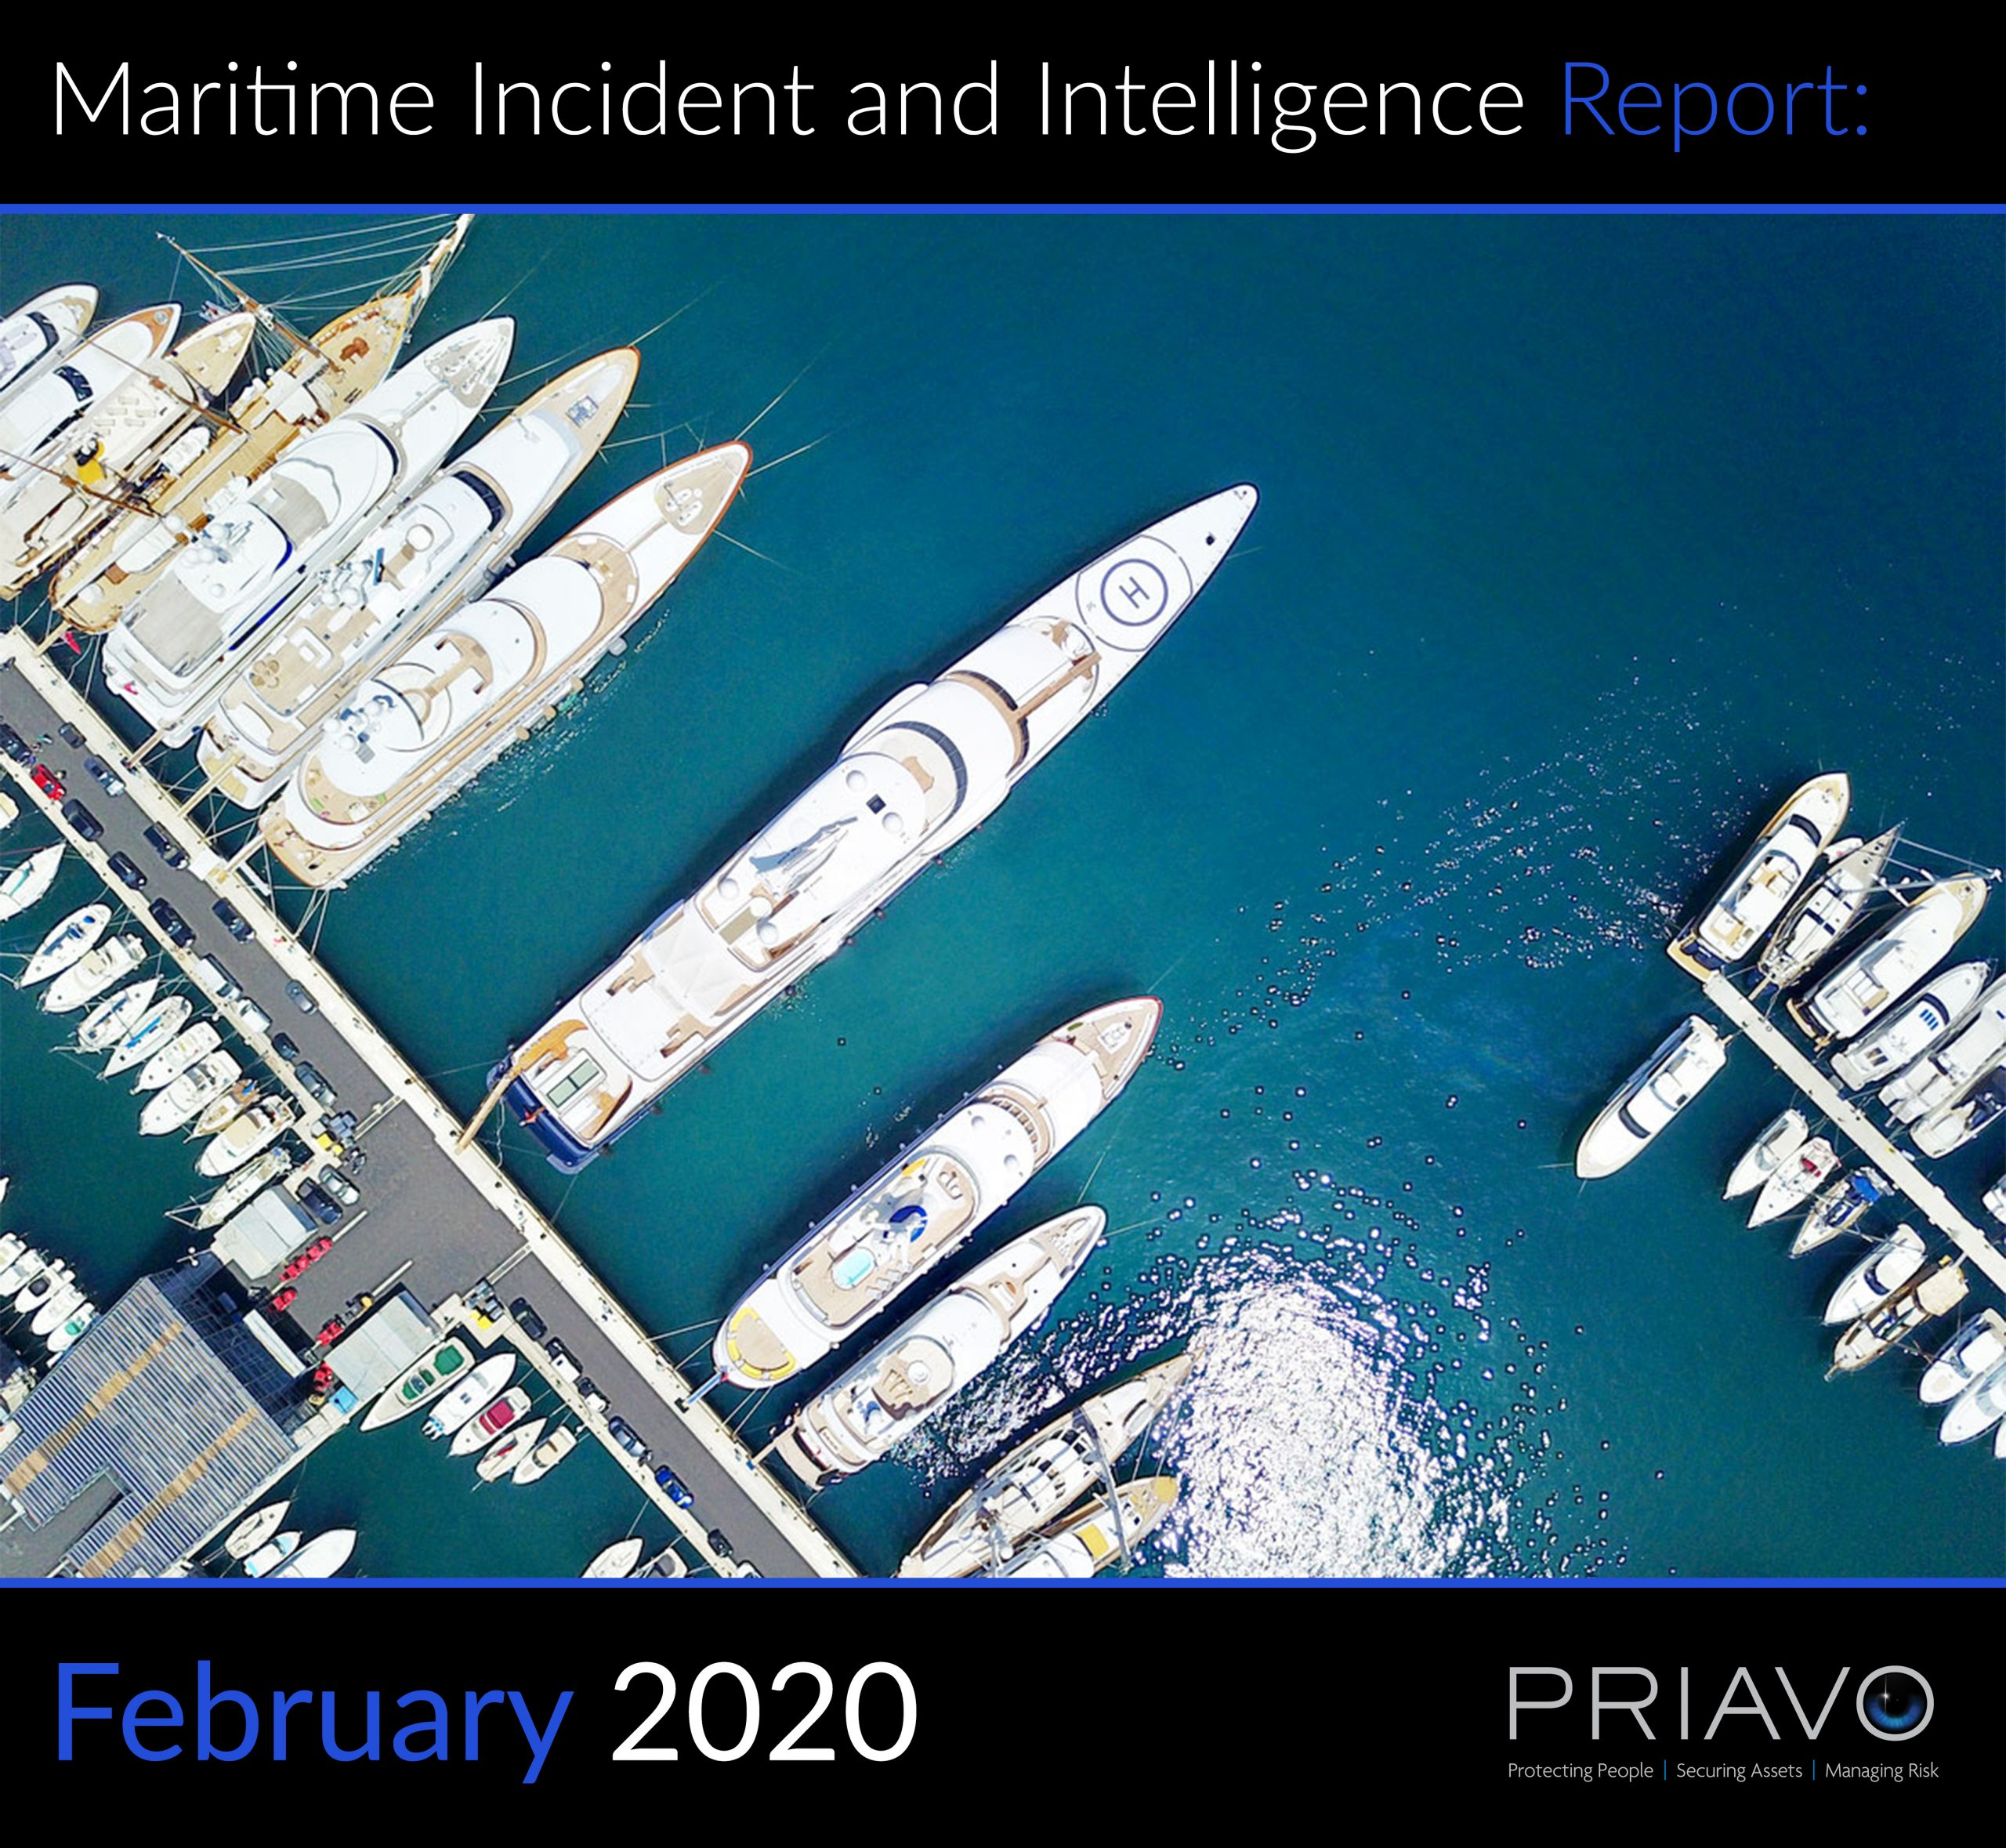 Maritime Incident Report: February 2020